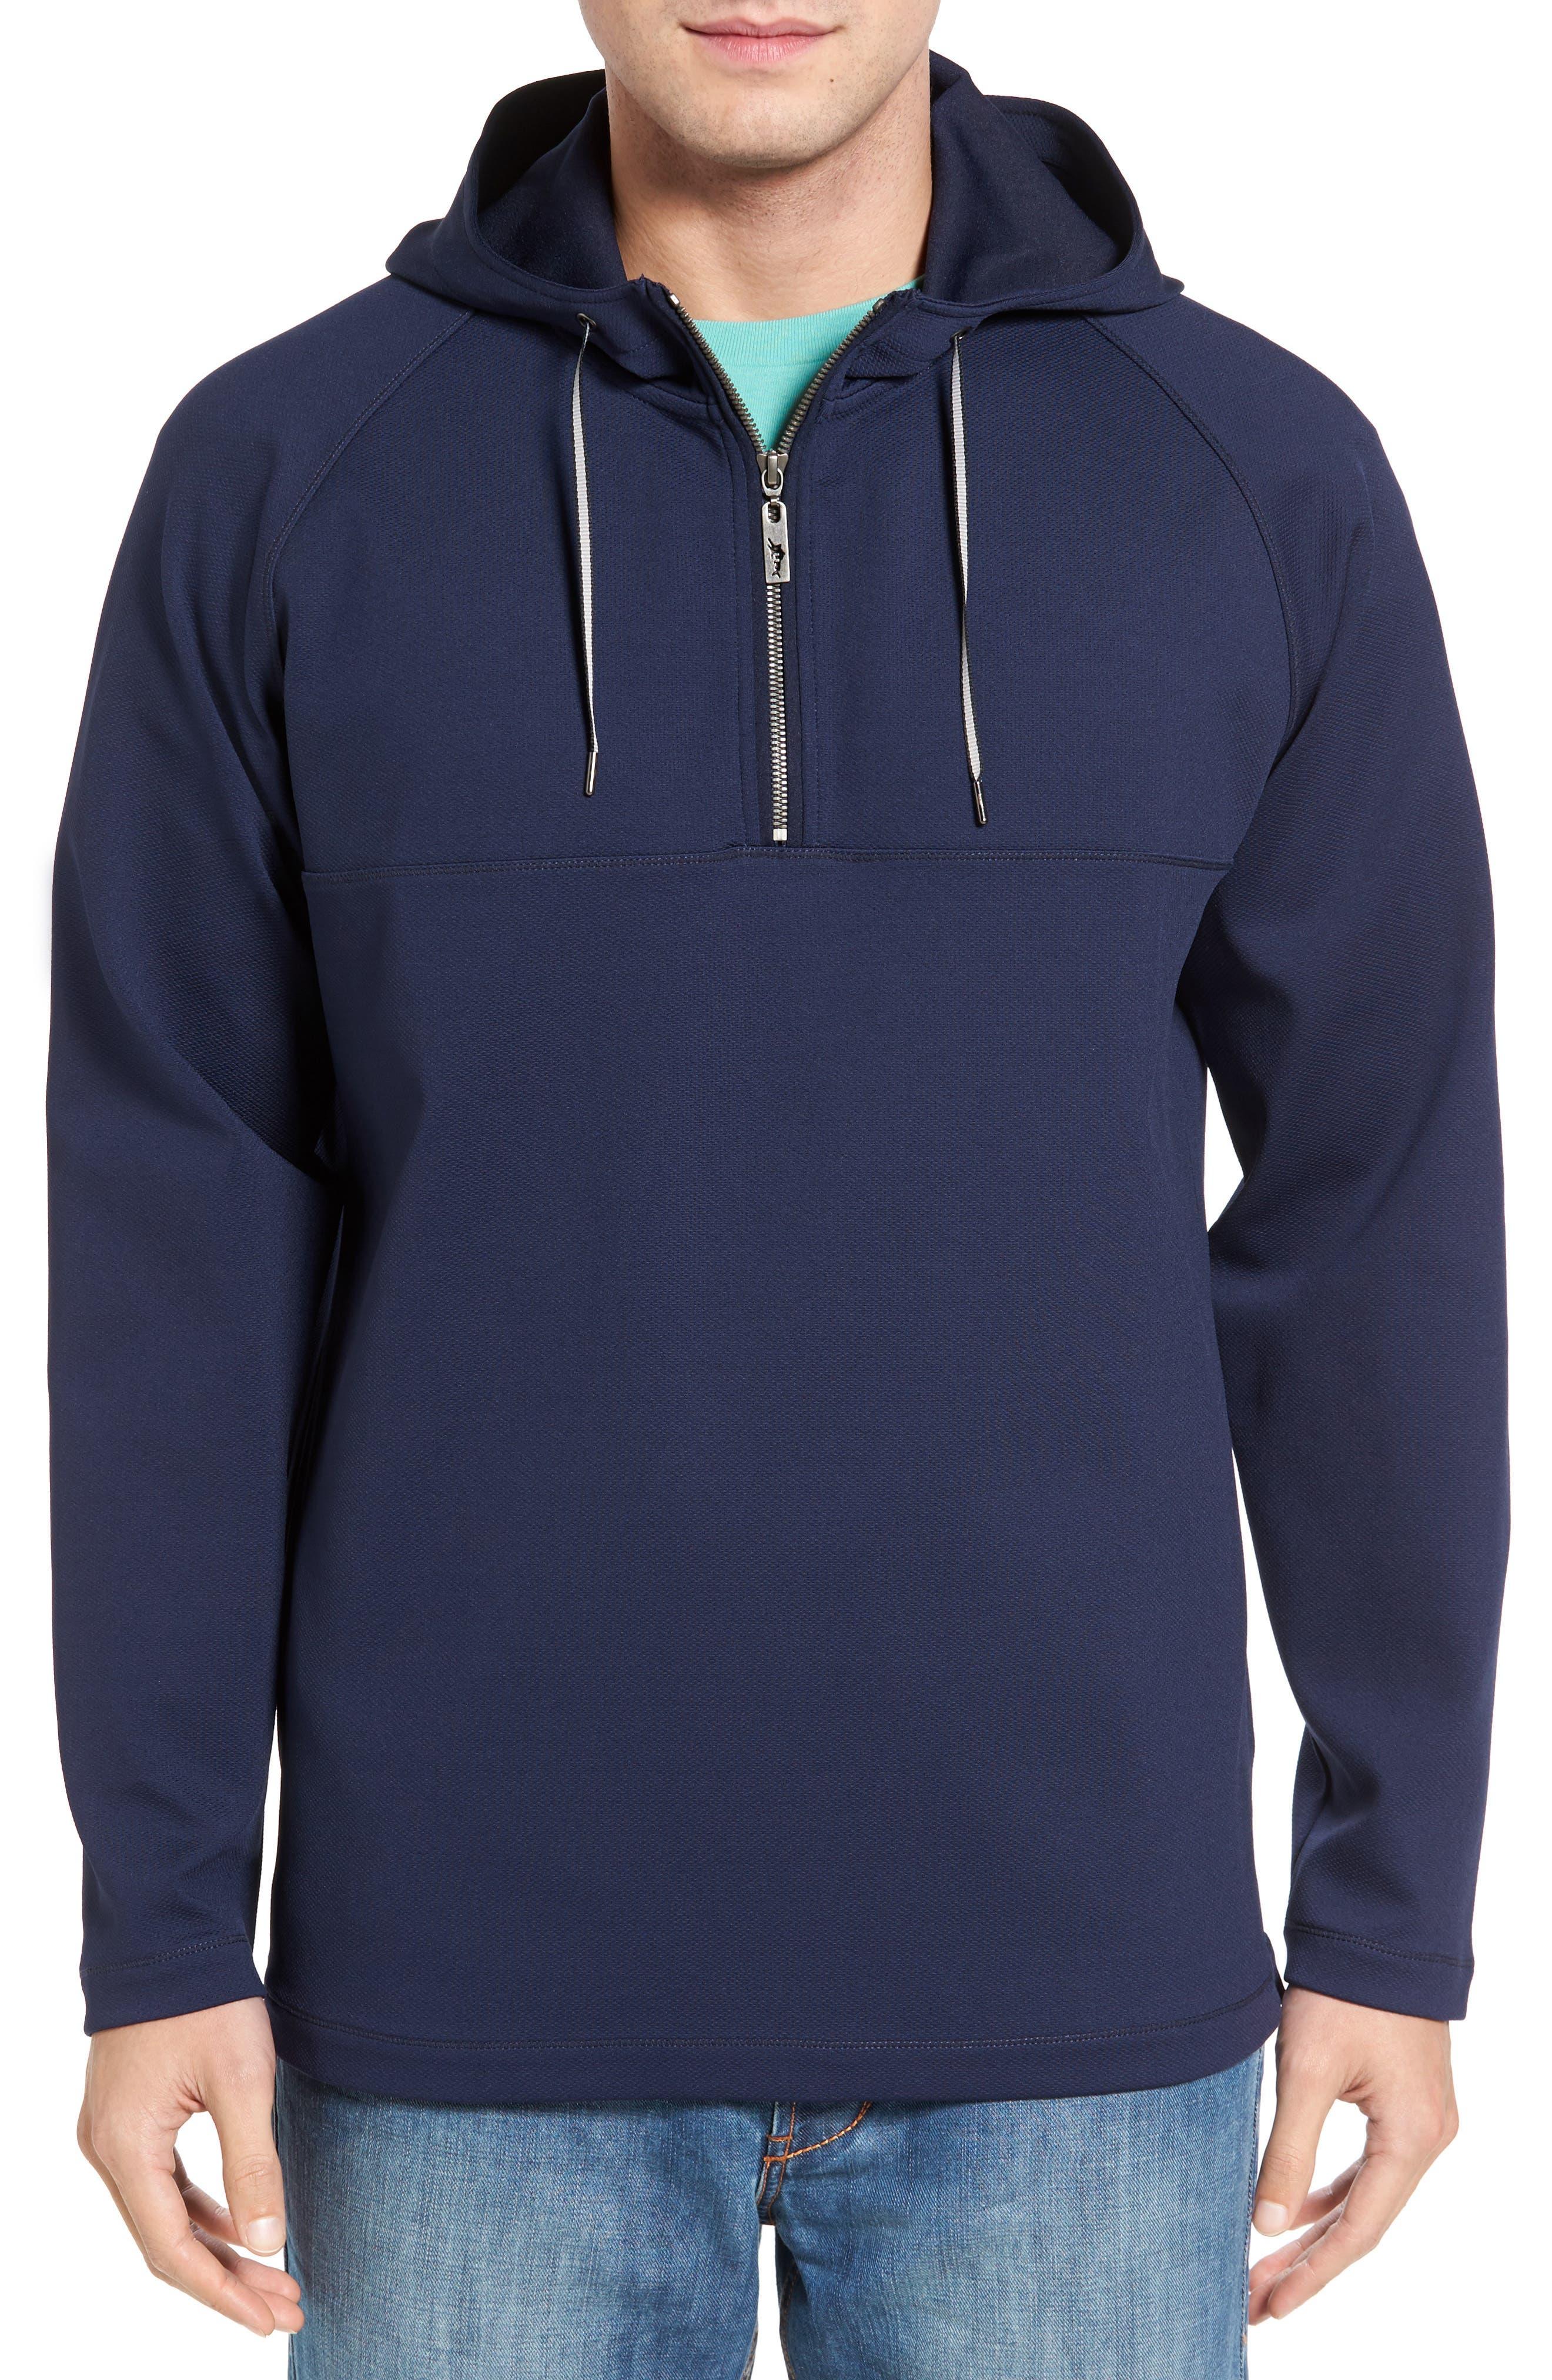 Weekend Pro Quarter Zip Hoodie,                         Main,                         color, 400